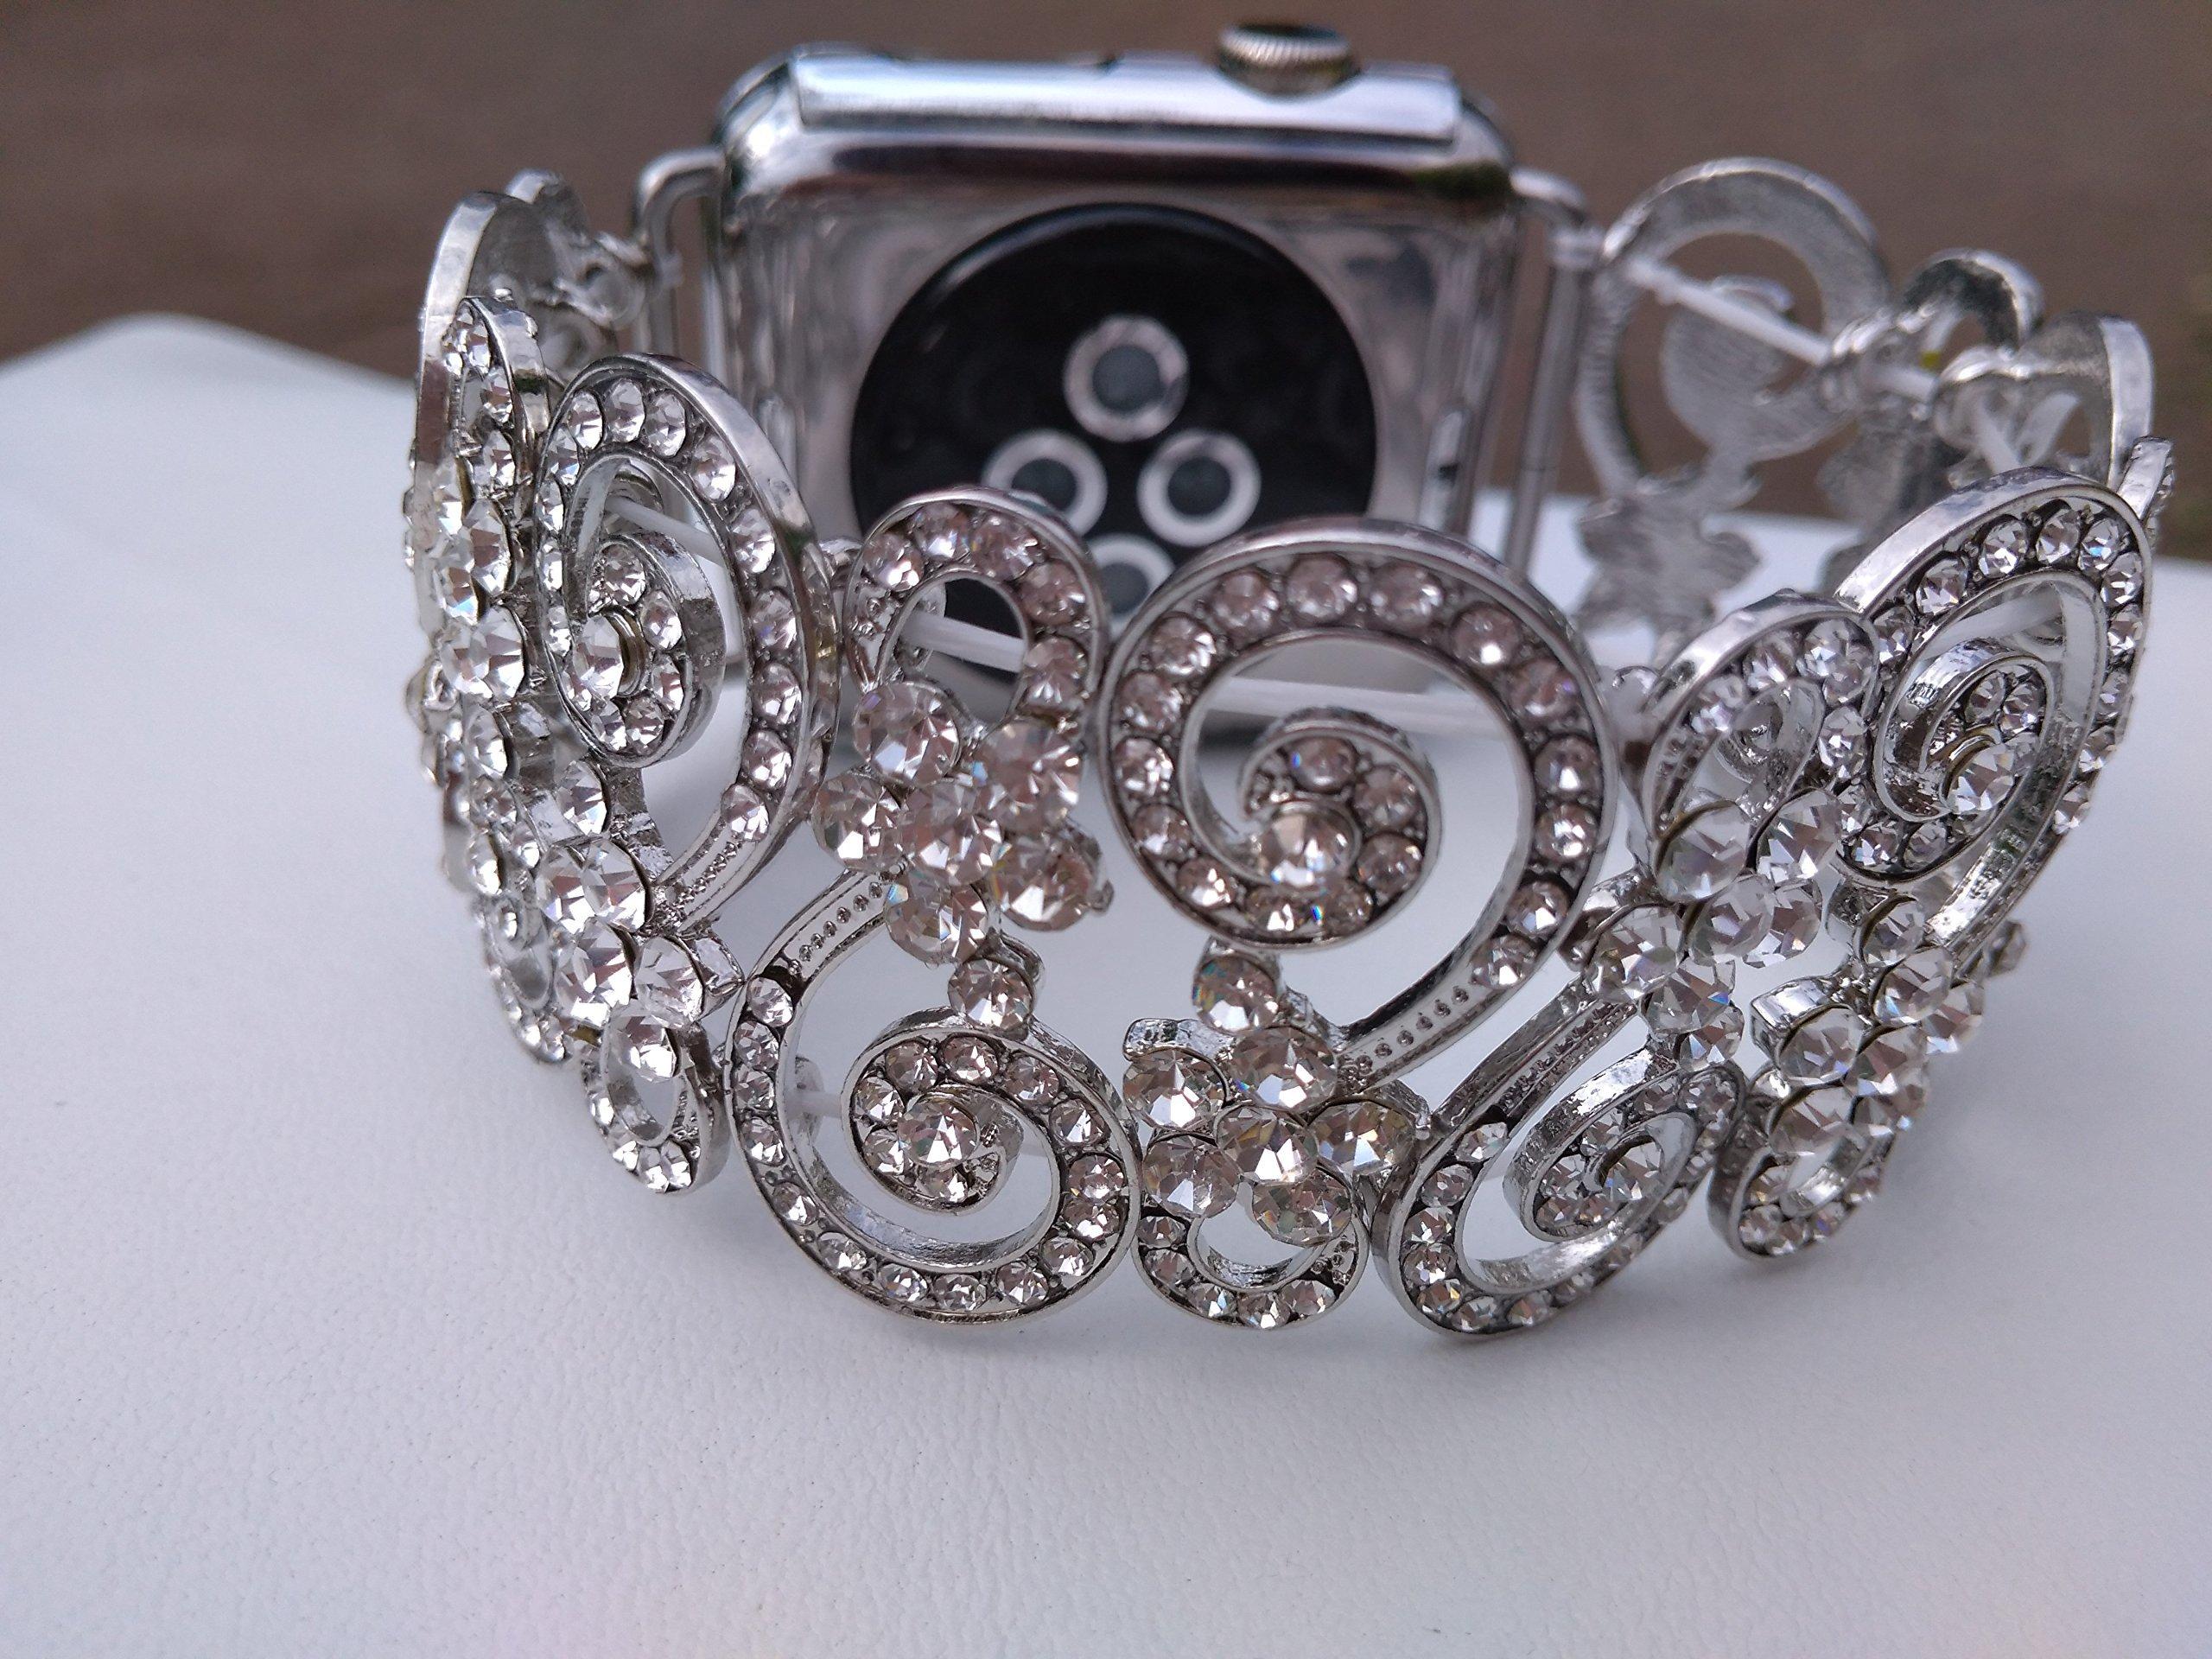 Rhinestone Apple Watch Band 38mm, bling , 42 mm rose gold Silver Apple iWatch Band 38 mm Bracelet,